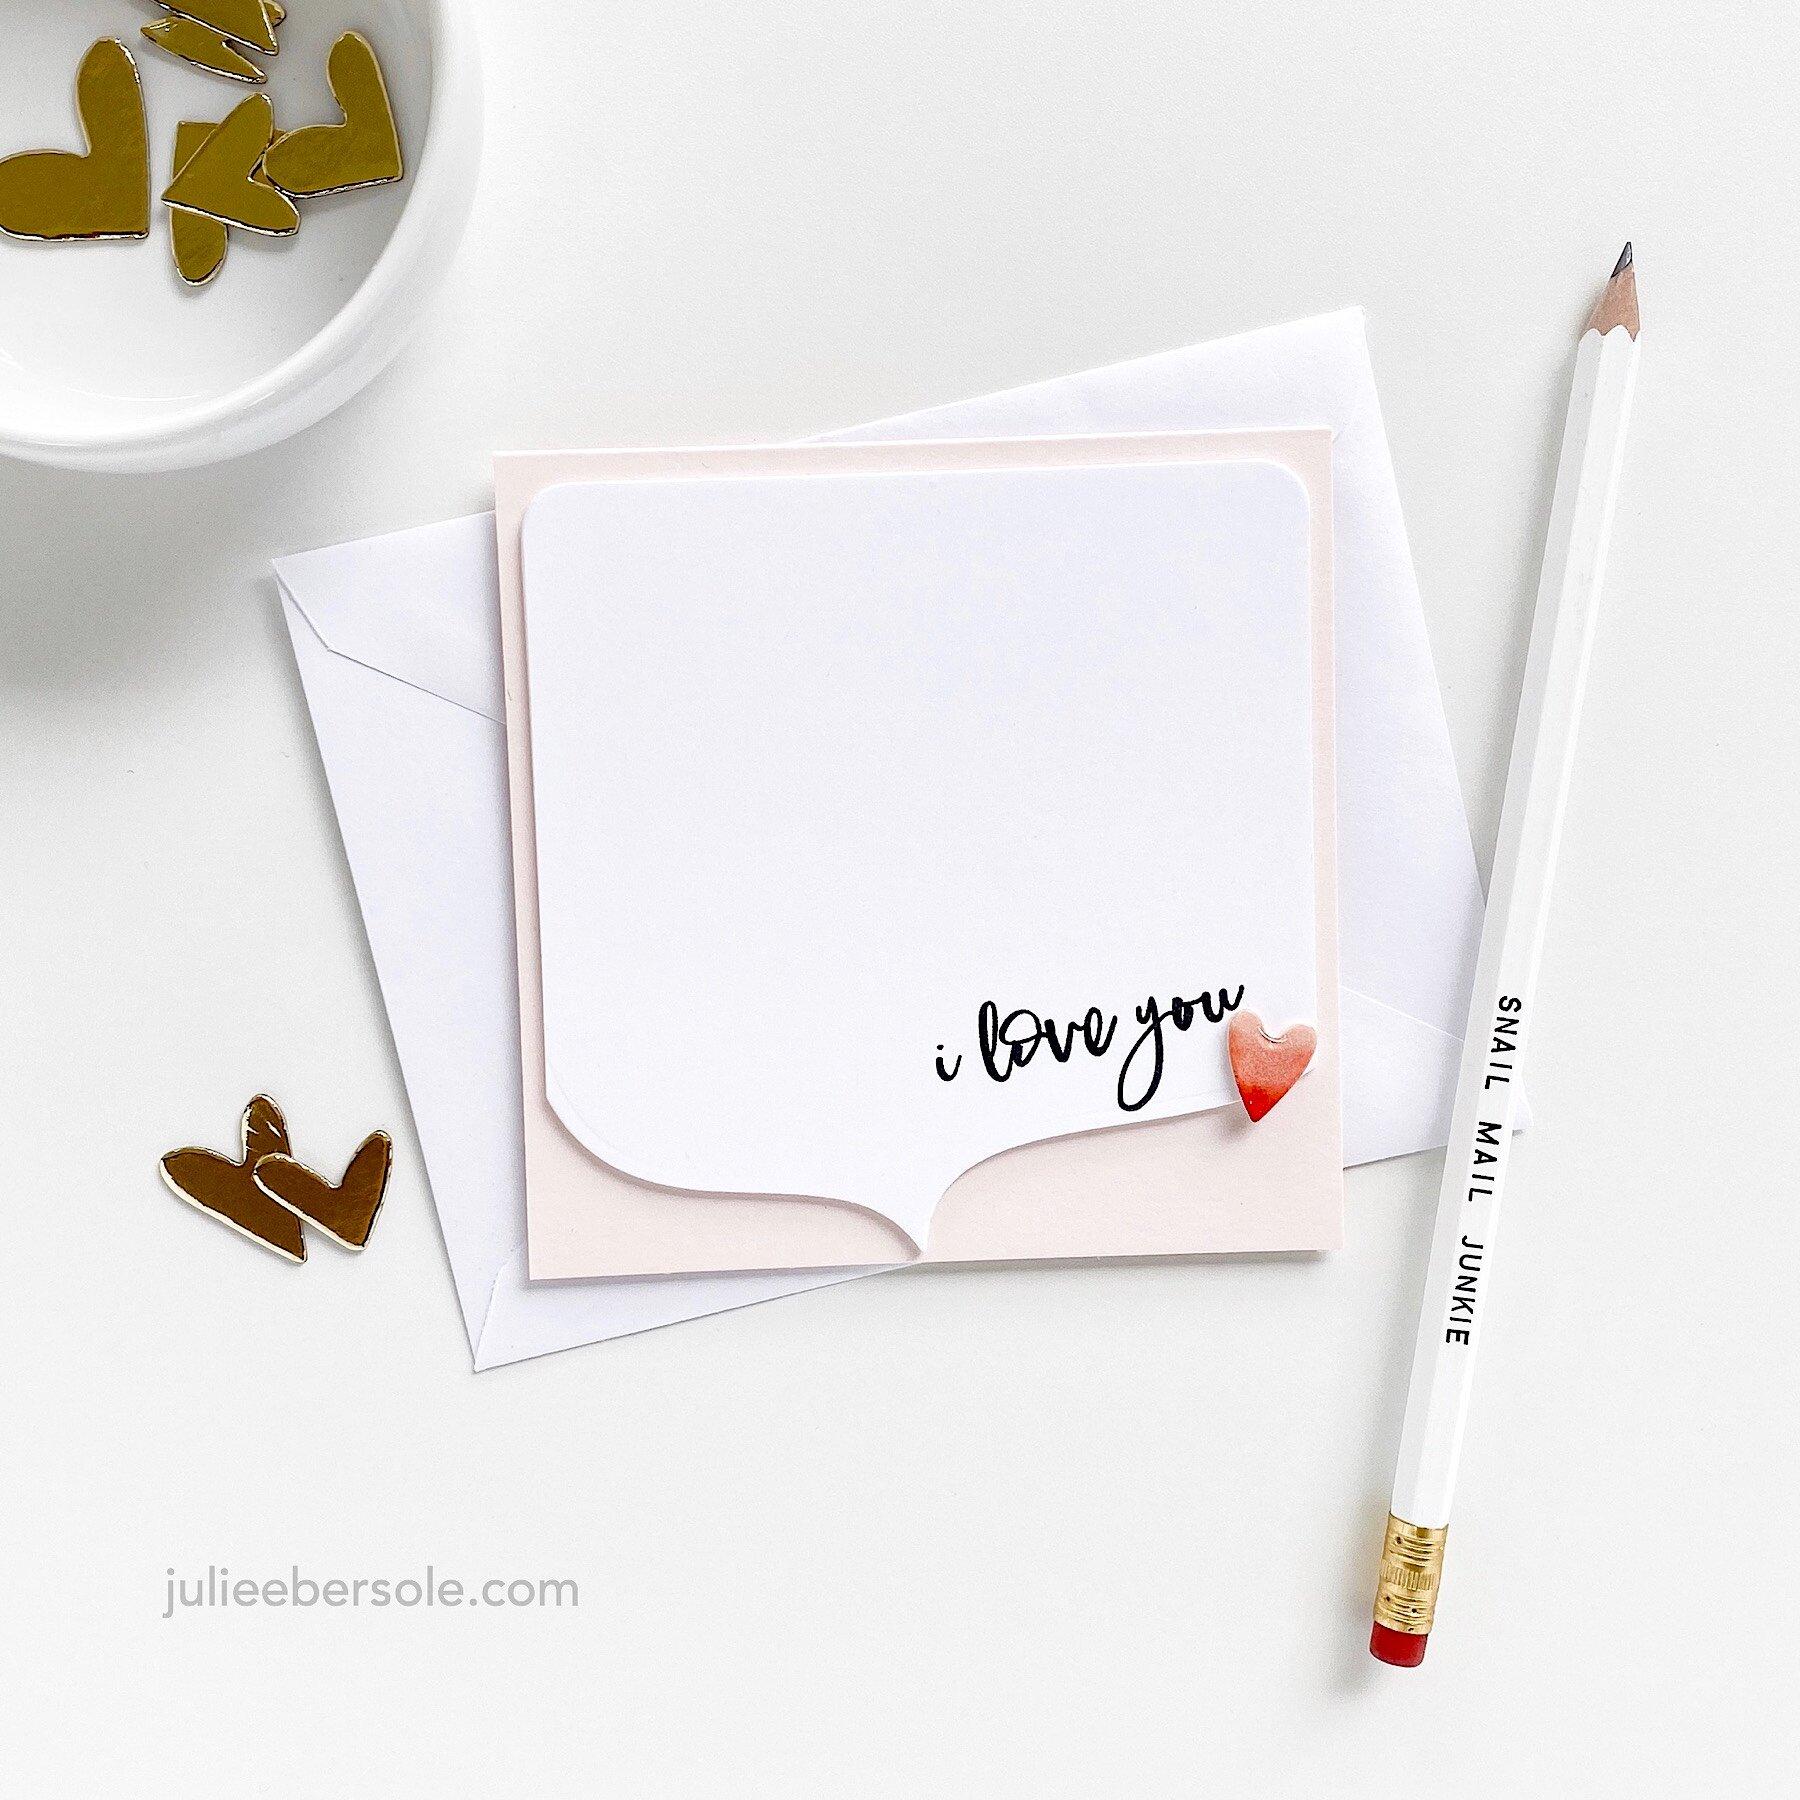 Feat.  Totally Random Sayings Volume 3 Stamp Set by Julie Ebersole  | Speech Bubbles by Julie Ebersole, Essentials By Ellen Designer Dies